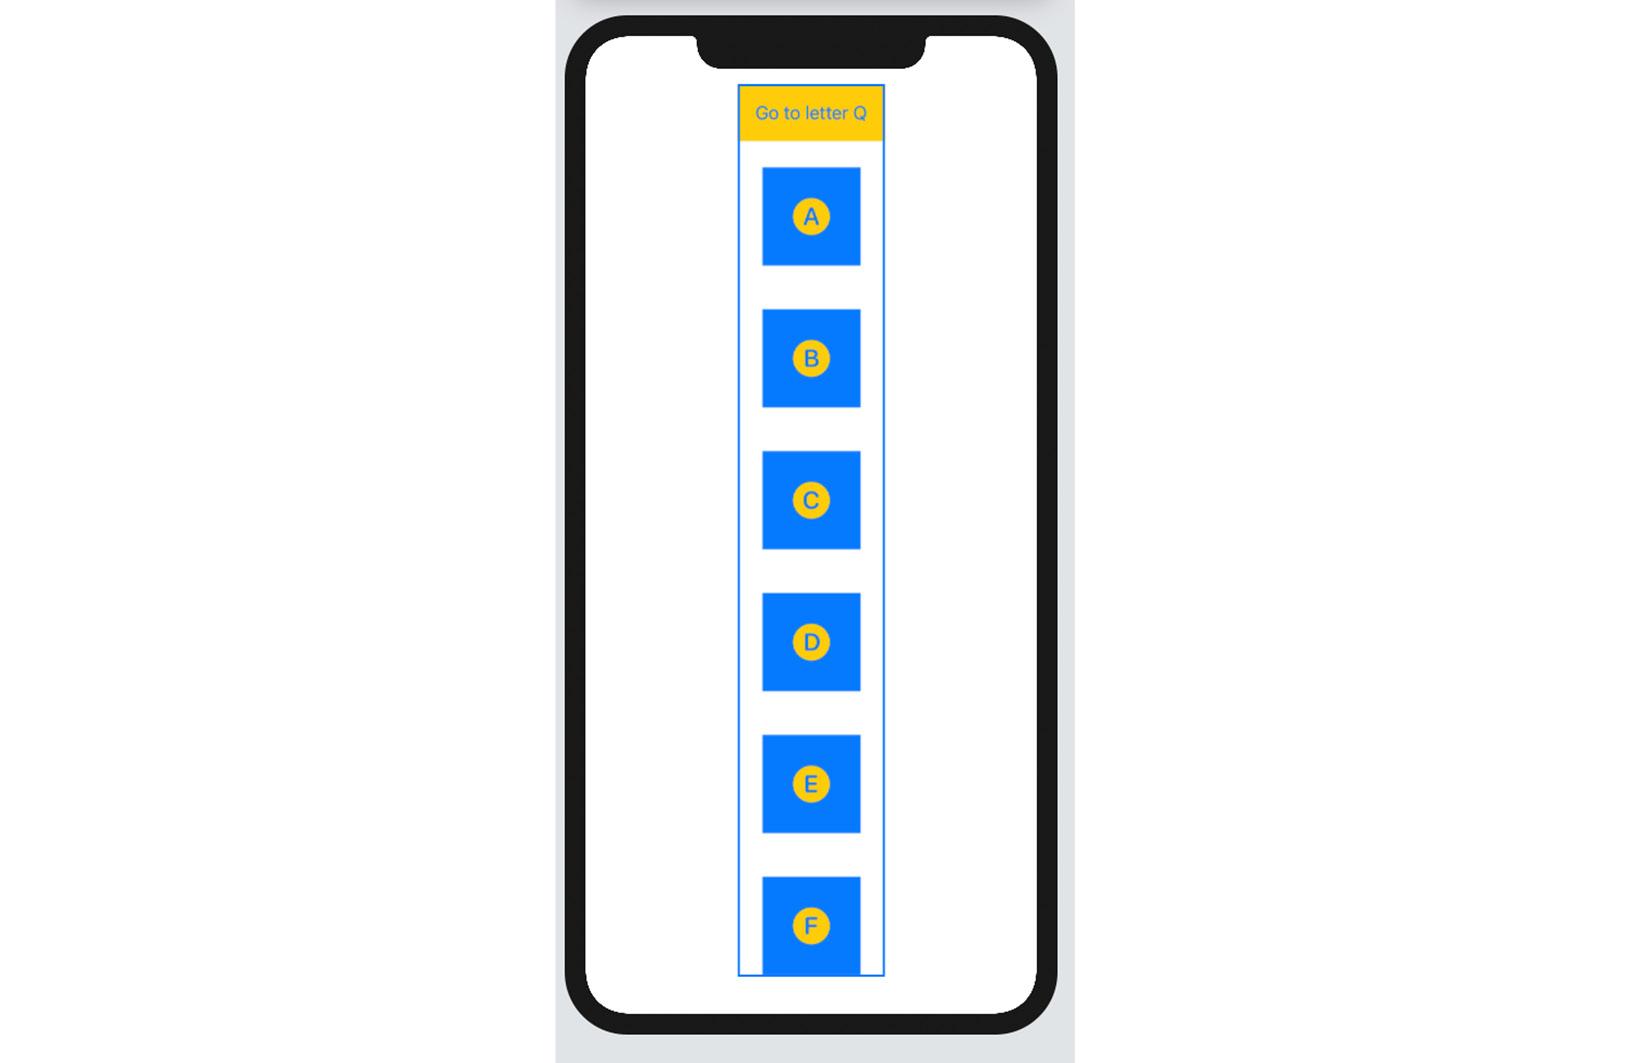 Figure 2.15 – The UsingScrollViewReader app